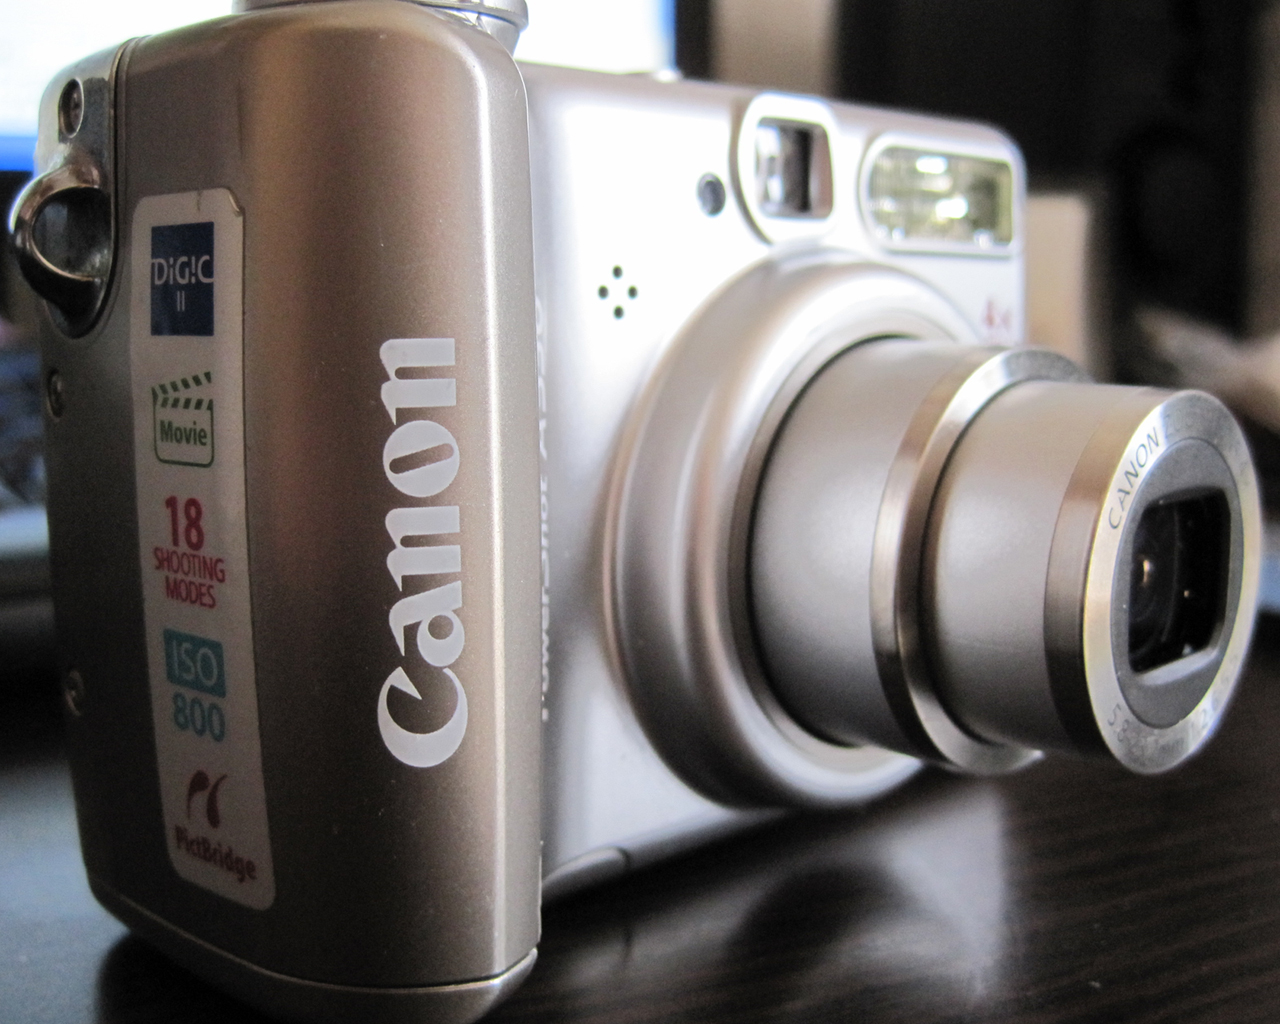 file canon powershot a530 jpg wikimedia commons rh commons wikimedia org Canon PowerShot A560 canon powershot a530 user manual